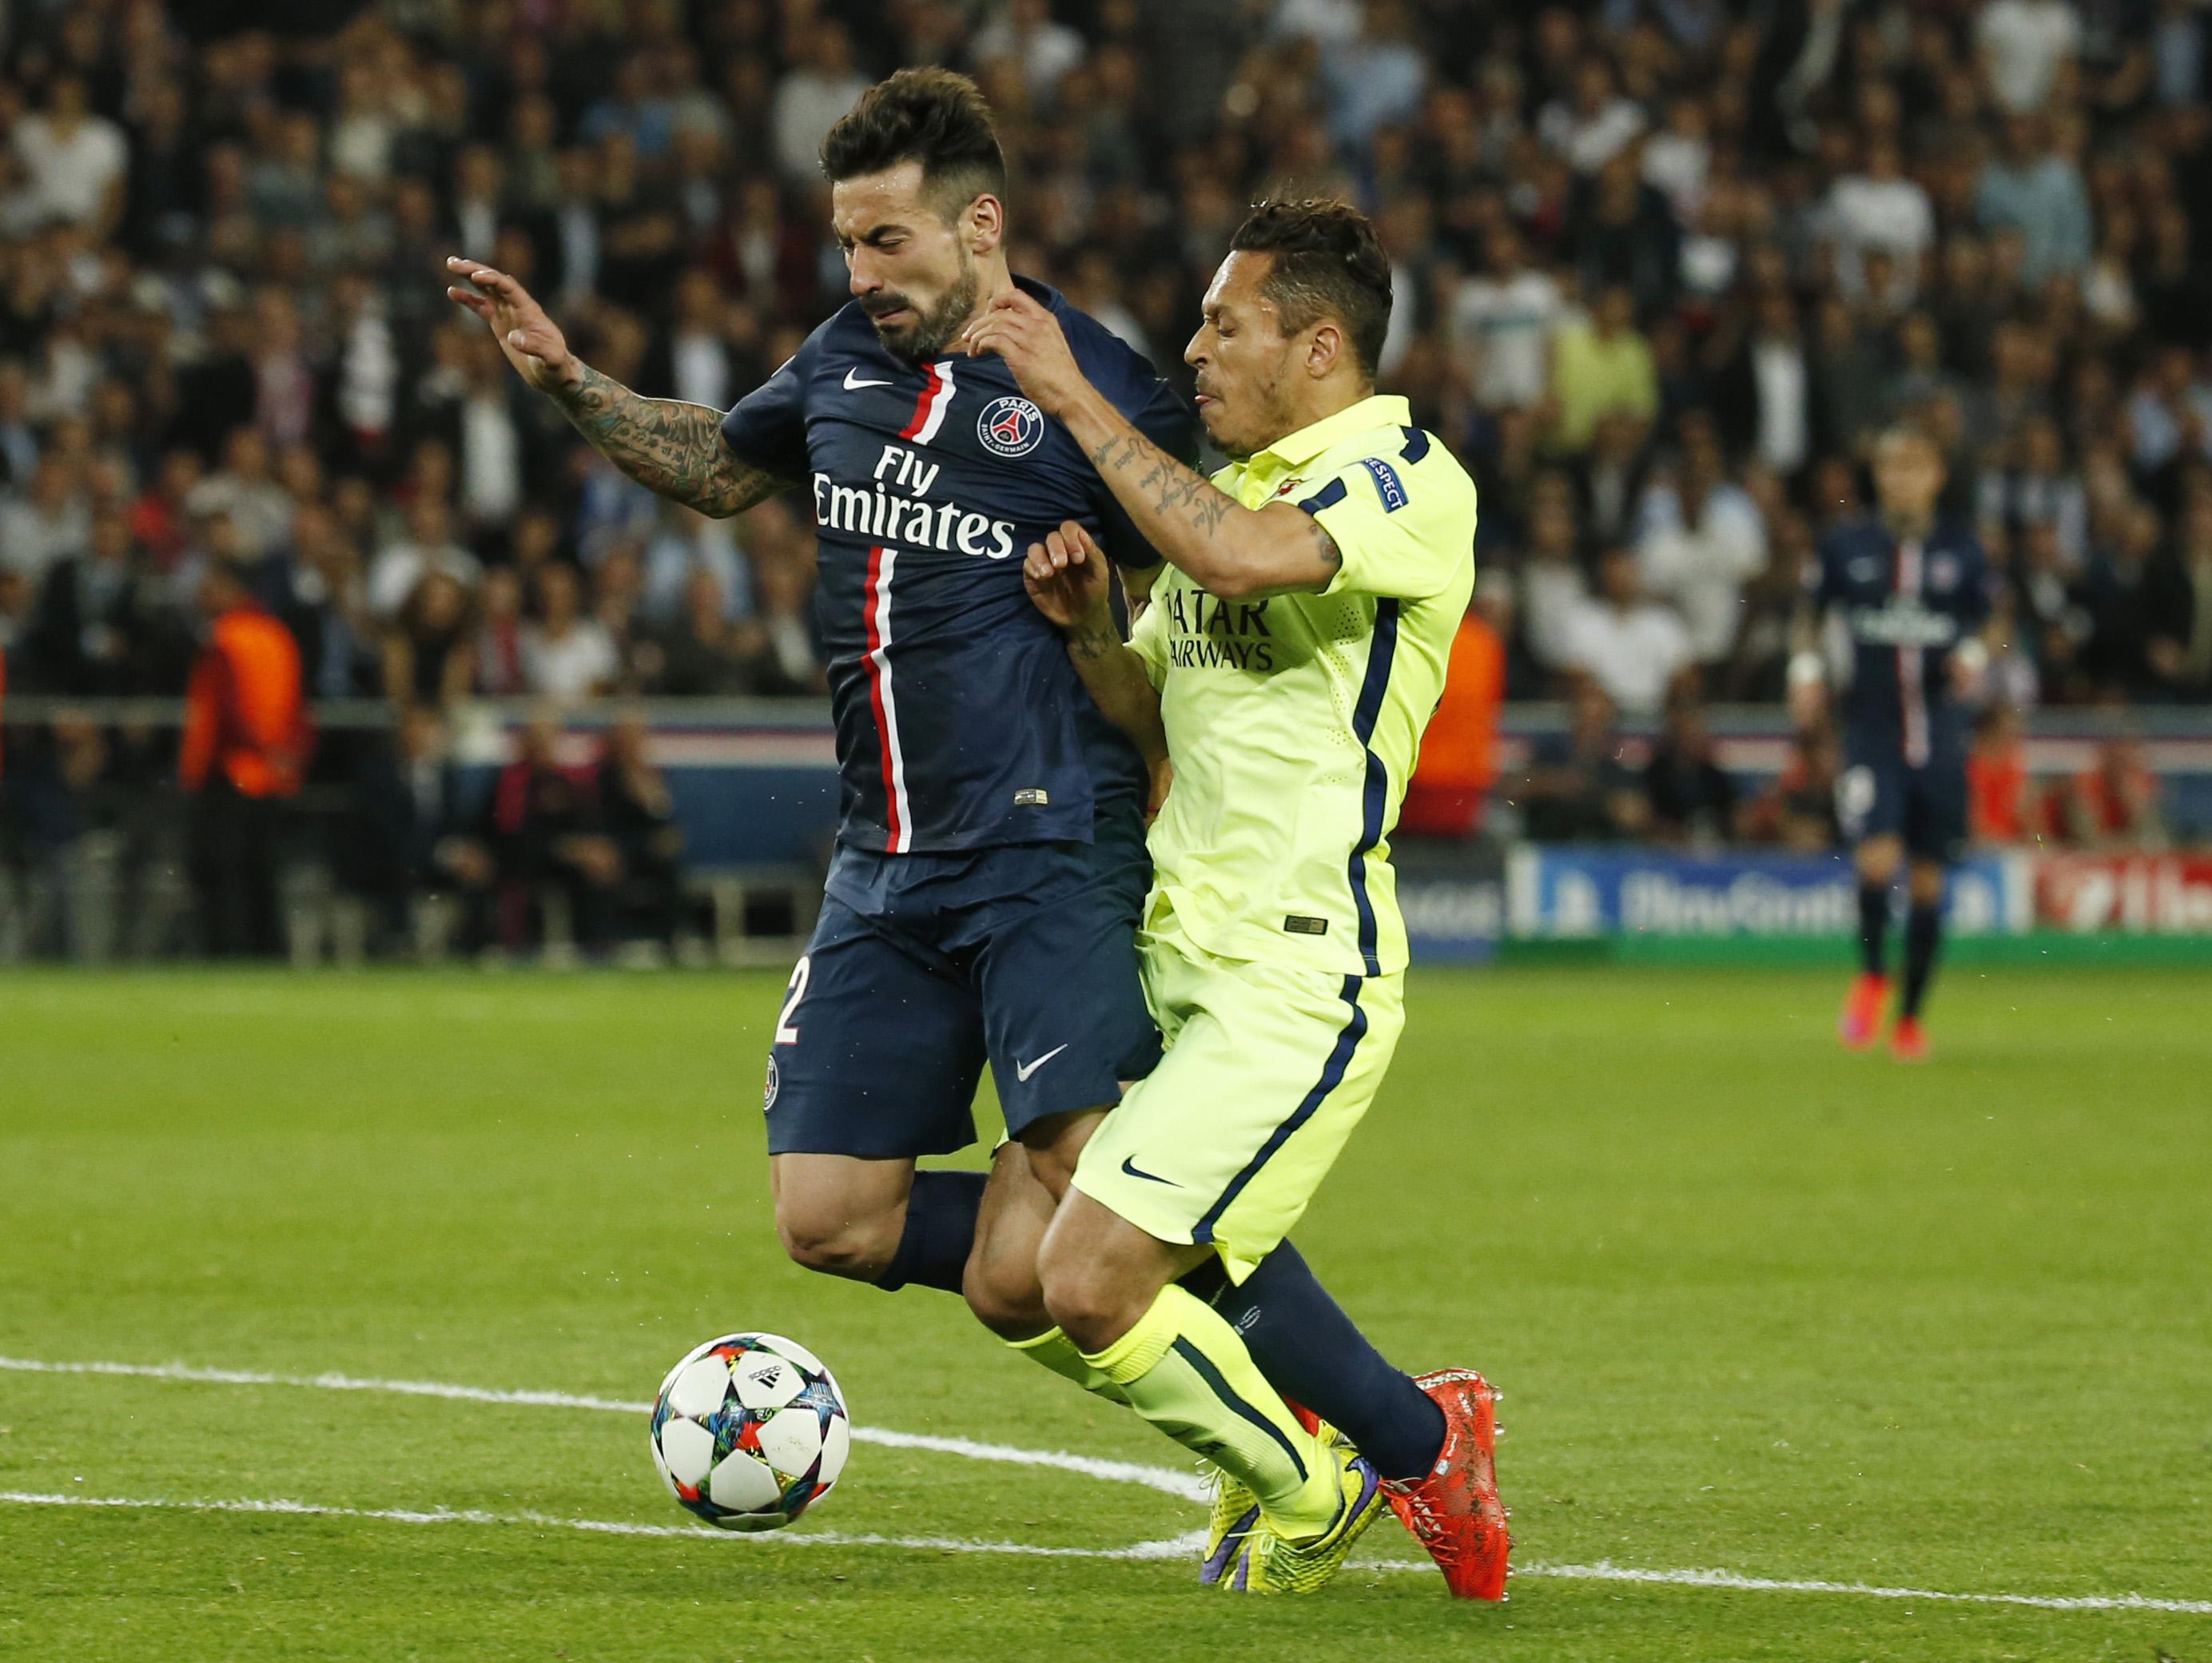 Neymar, Suarez snap PSG's unbeaten streak as Barcashine